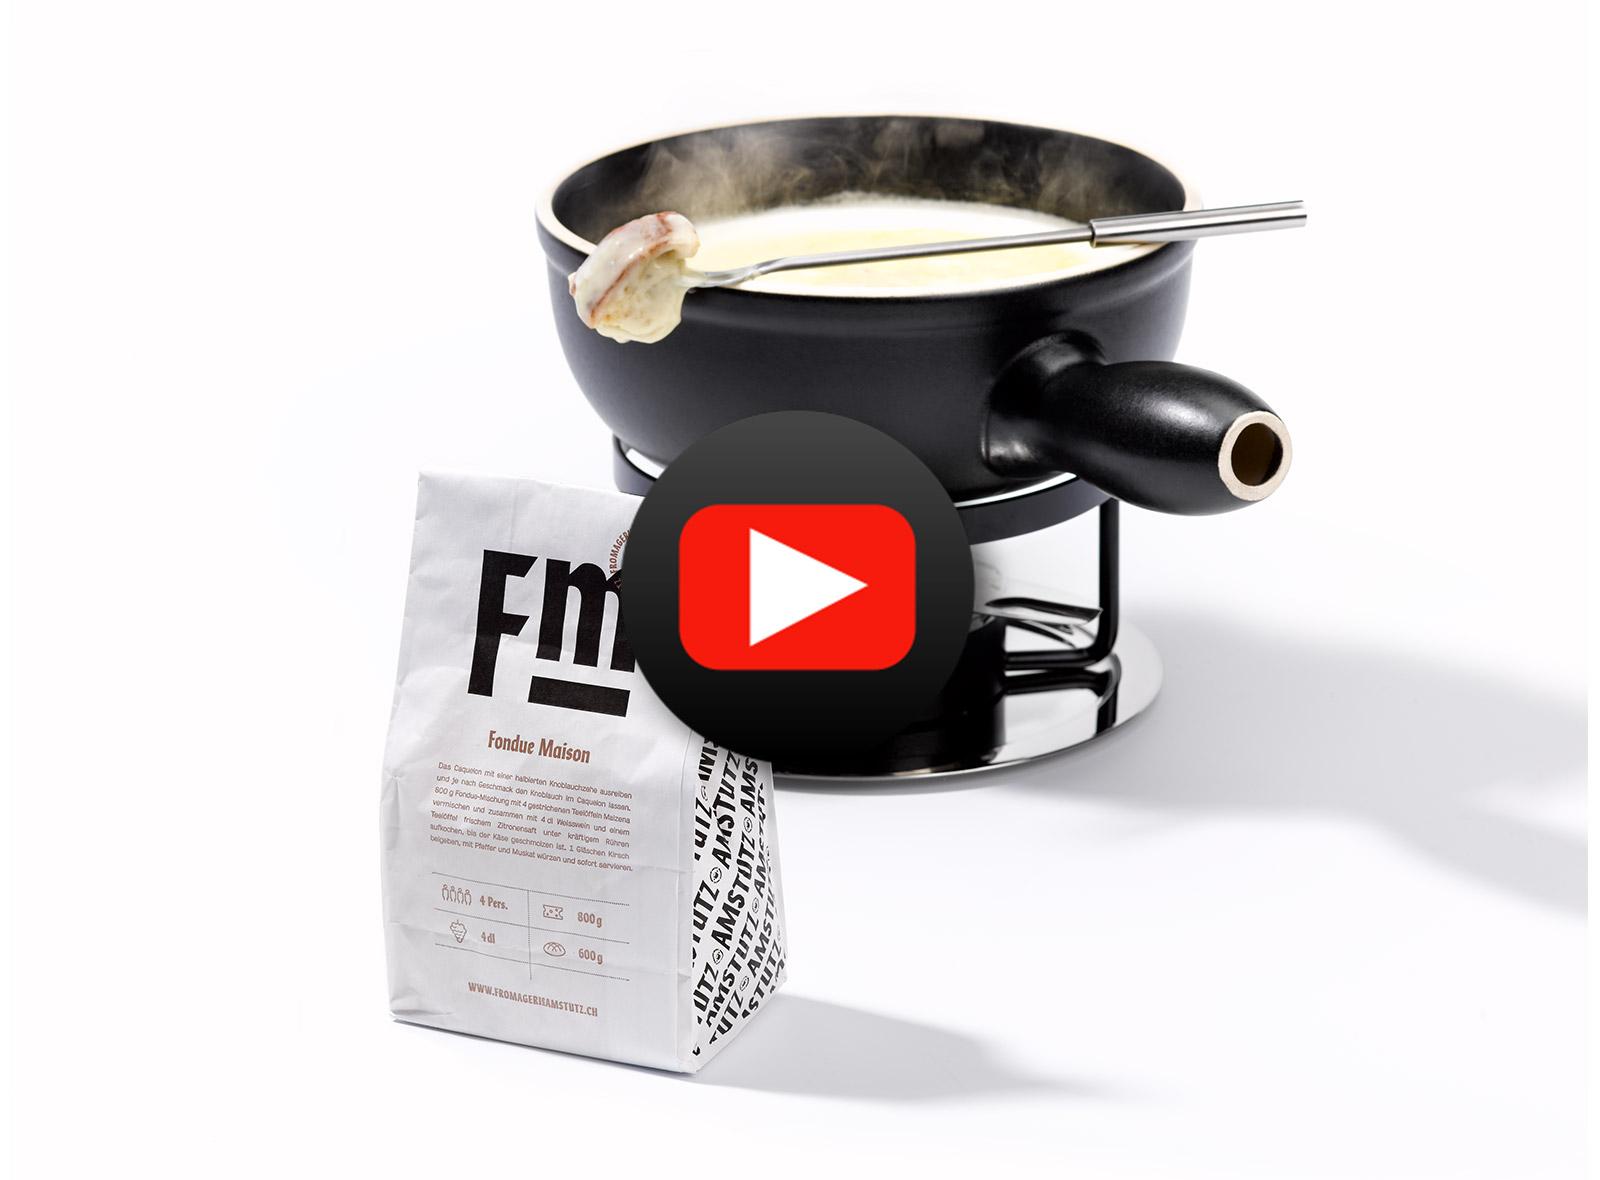 Video - Fondue kochen